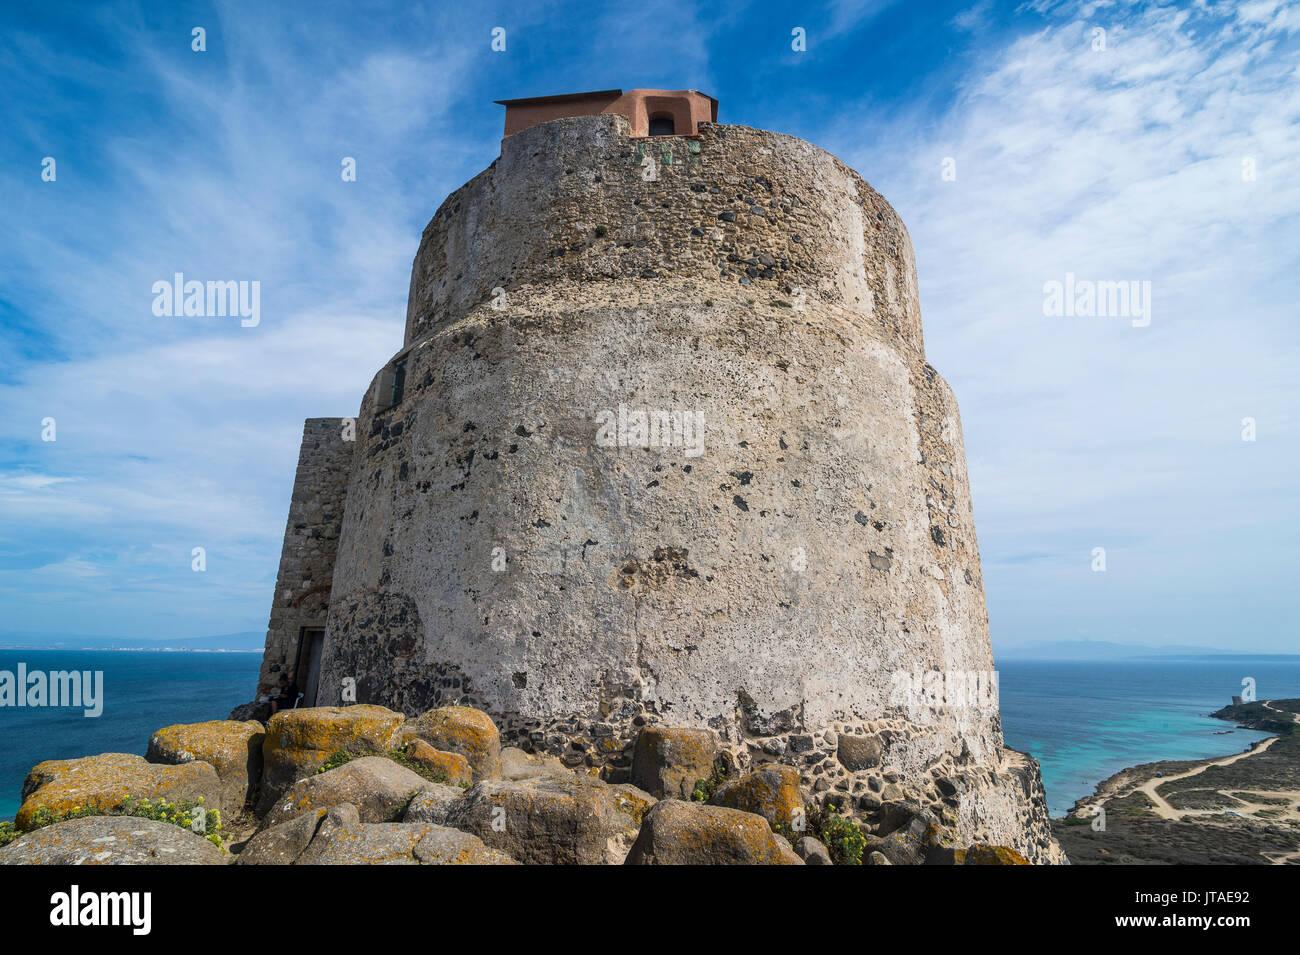 Torre de San Giovanni, Tharros, Cerdeña, Italia, Mediterráneo, Europa Imagen De Stock